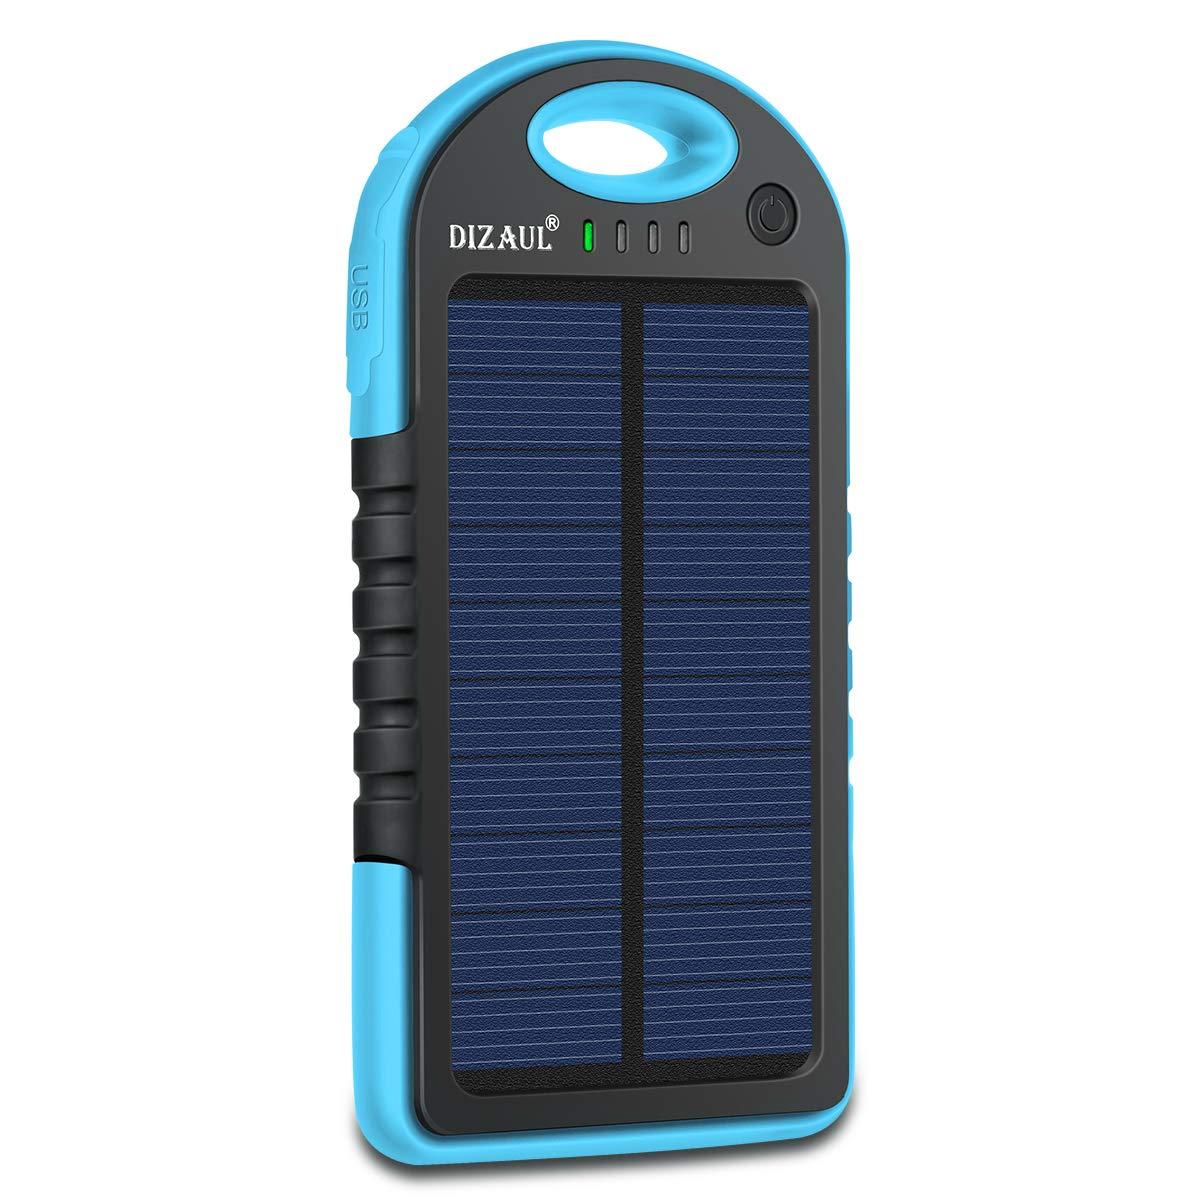 DIZAUL Solar Charger